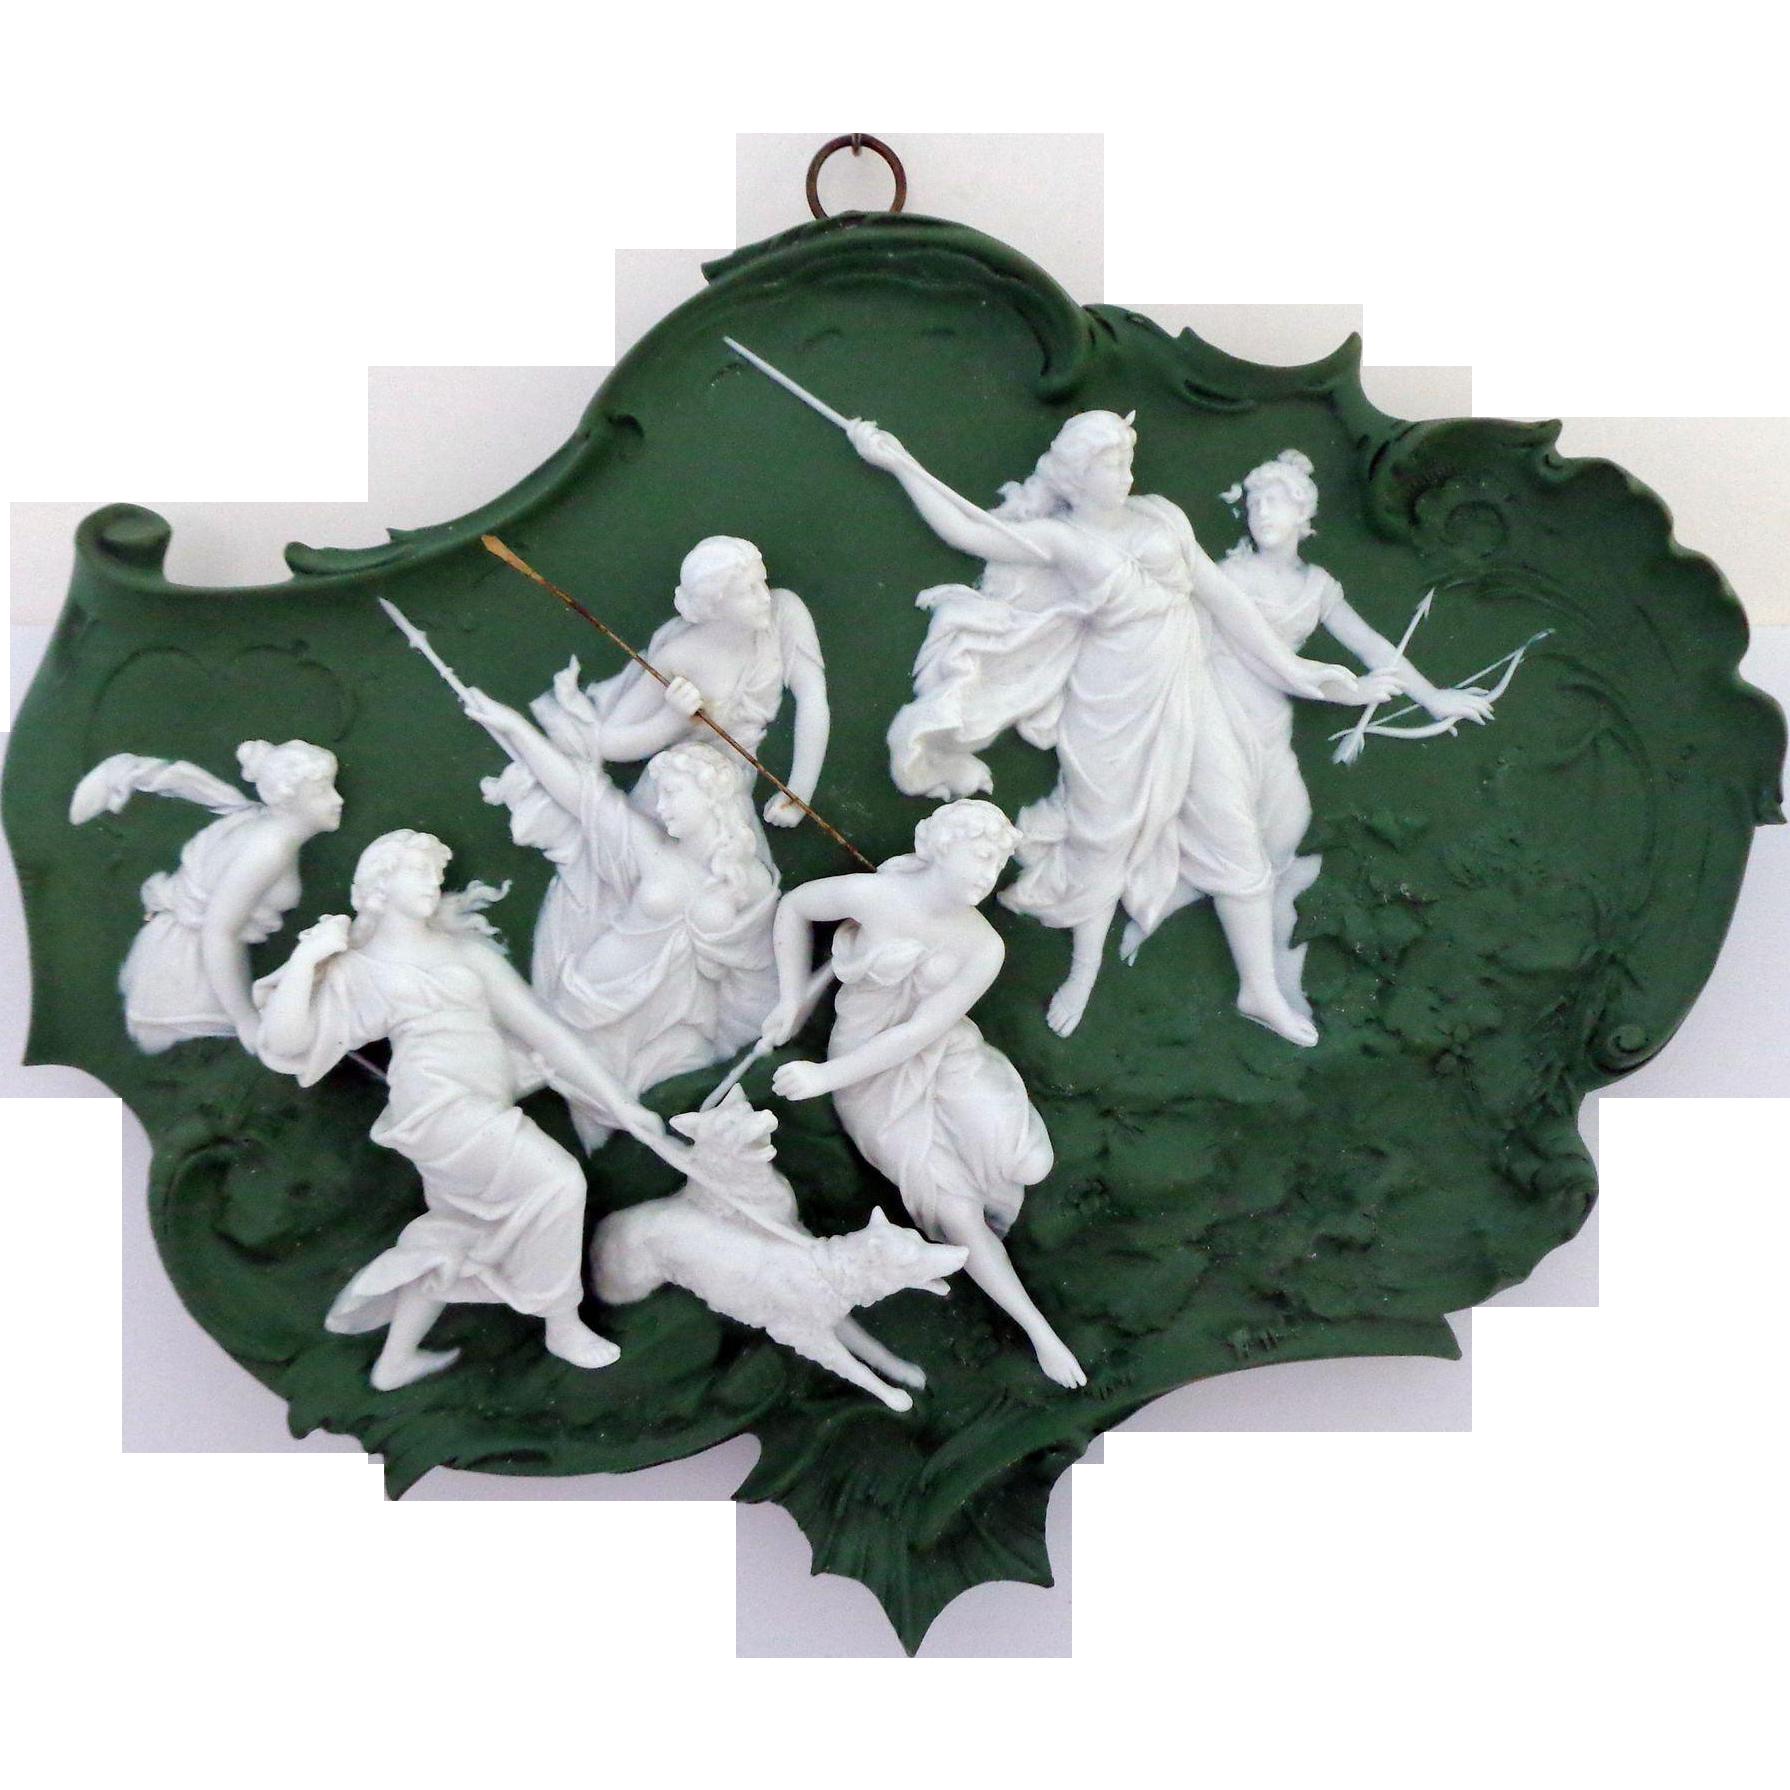 Pristine Volkstedt Jasper Ware Jasperware Plaque with 9 Very 3 Dimensional Figures Allegorical Scene